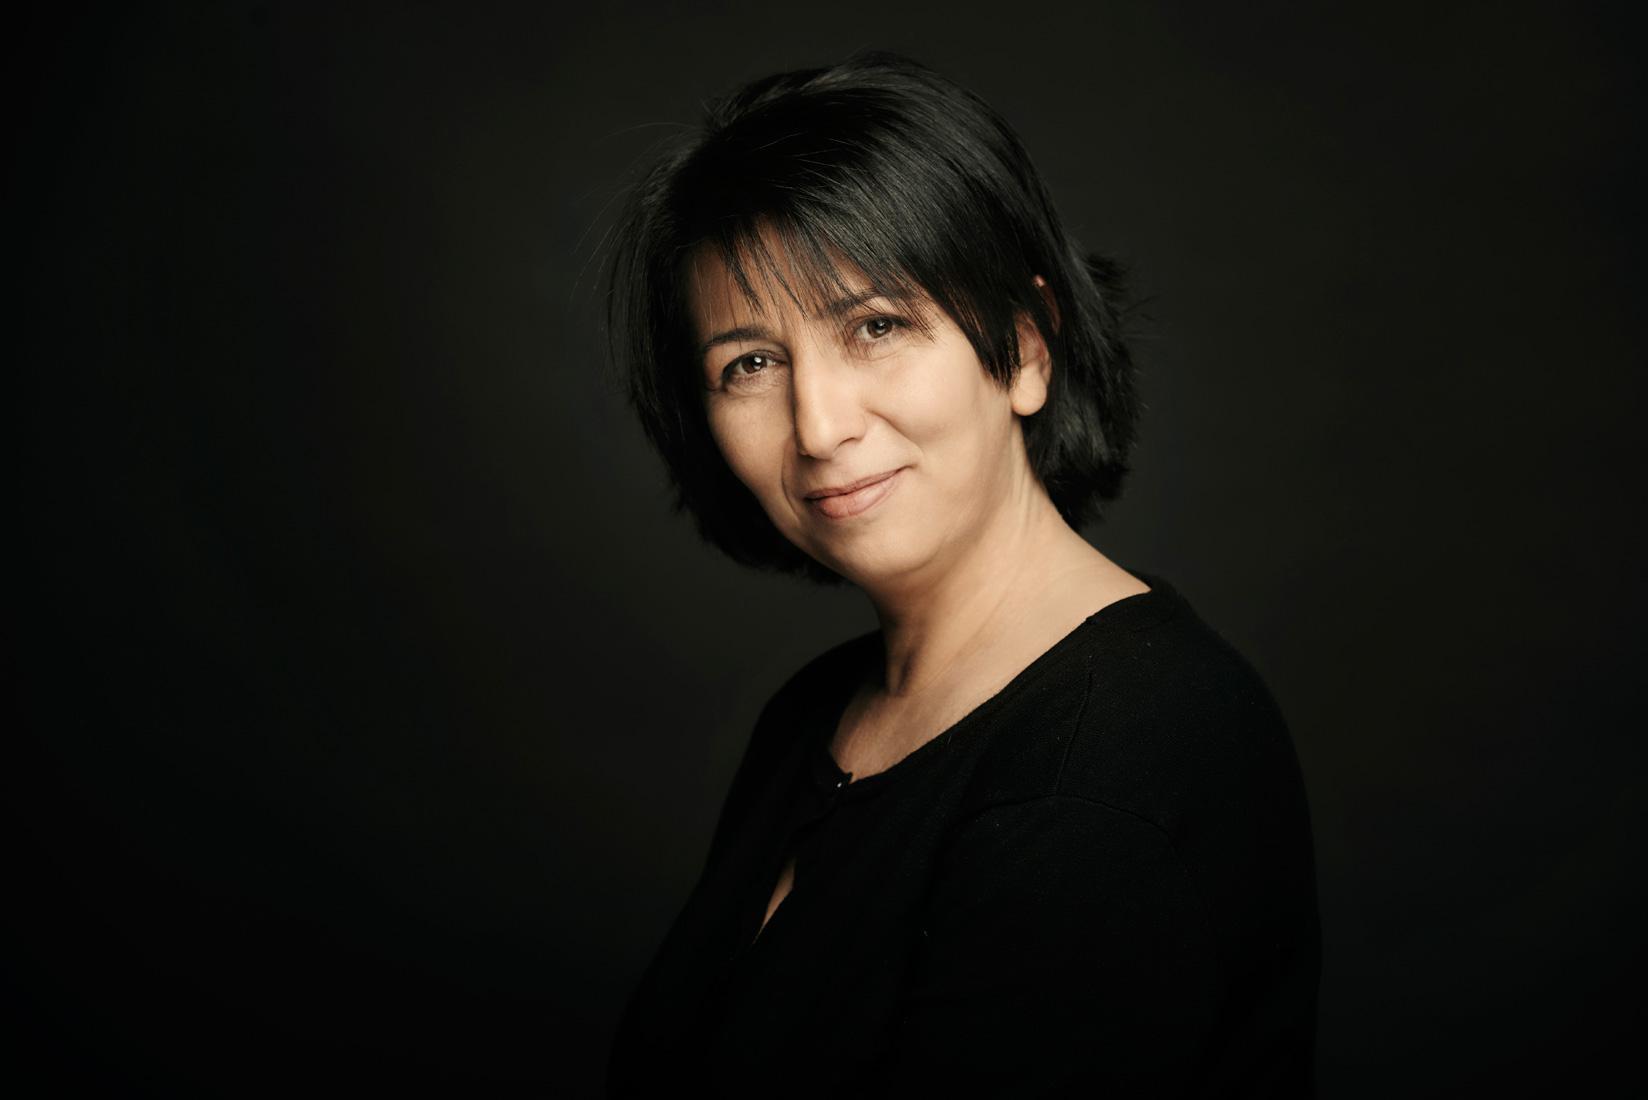 Renata Tanollari